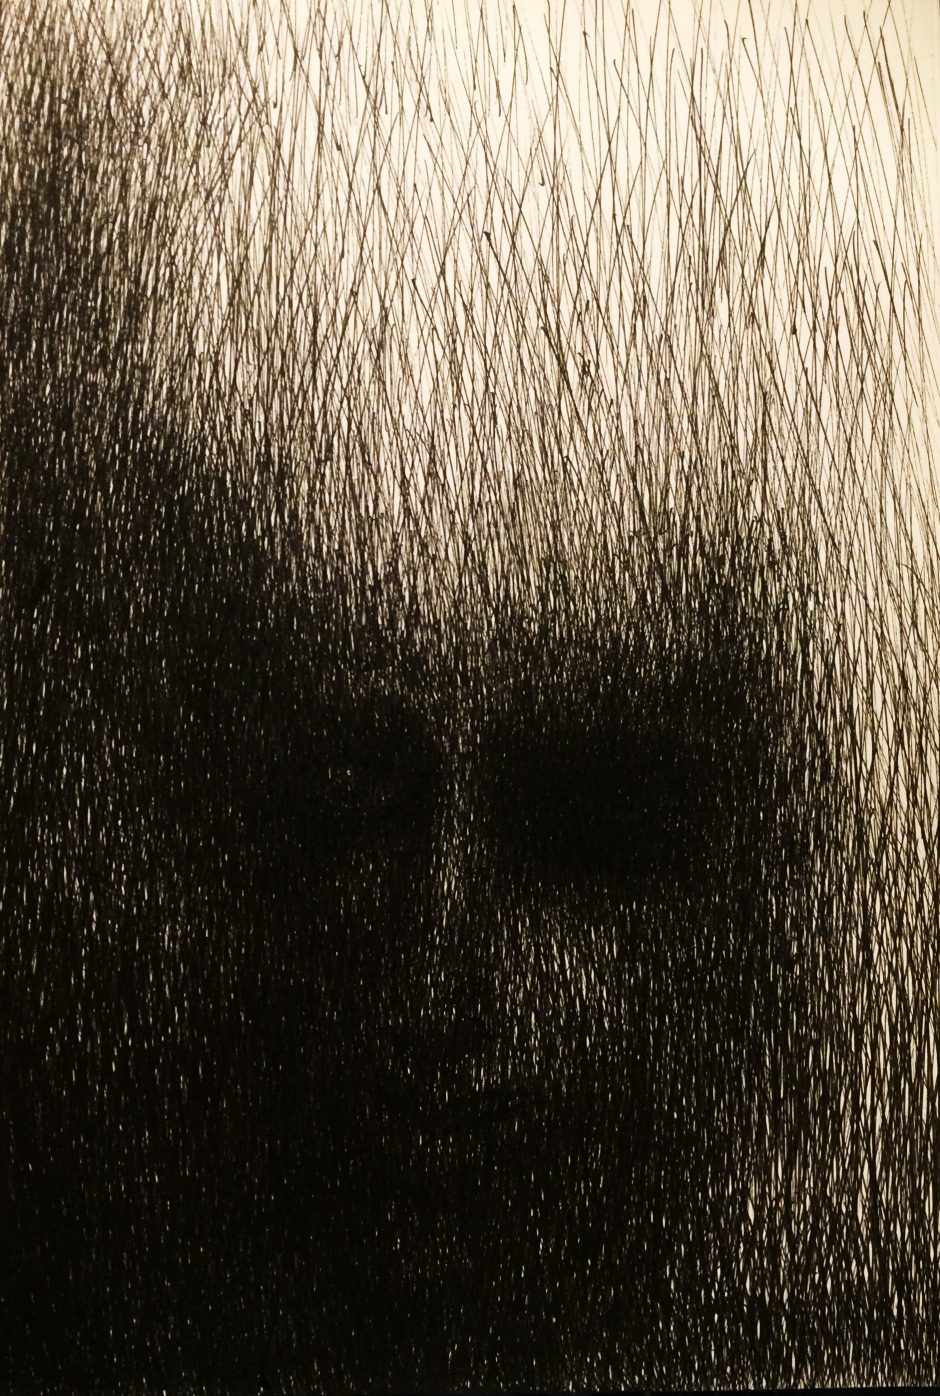 06_Schatten